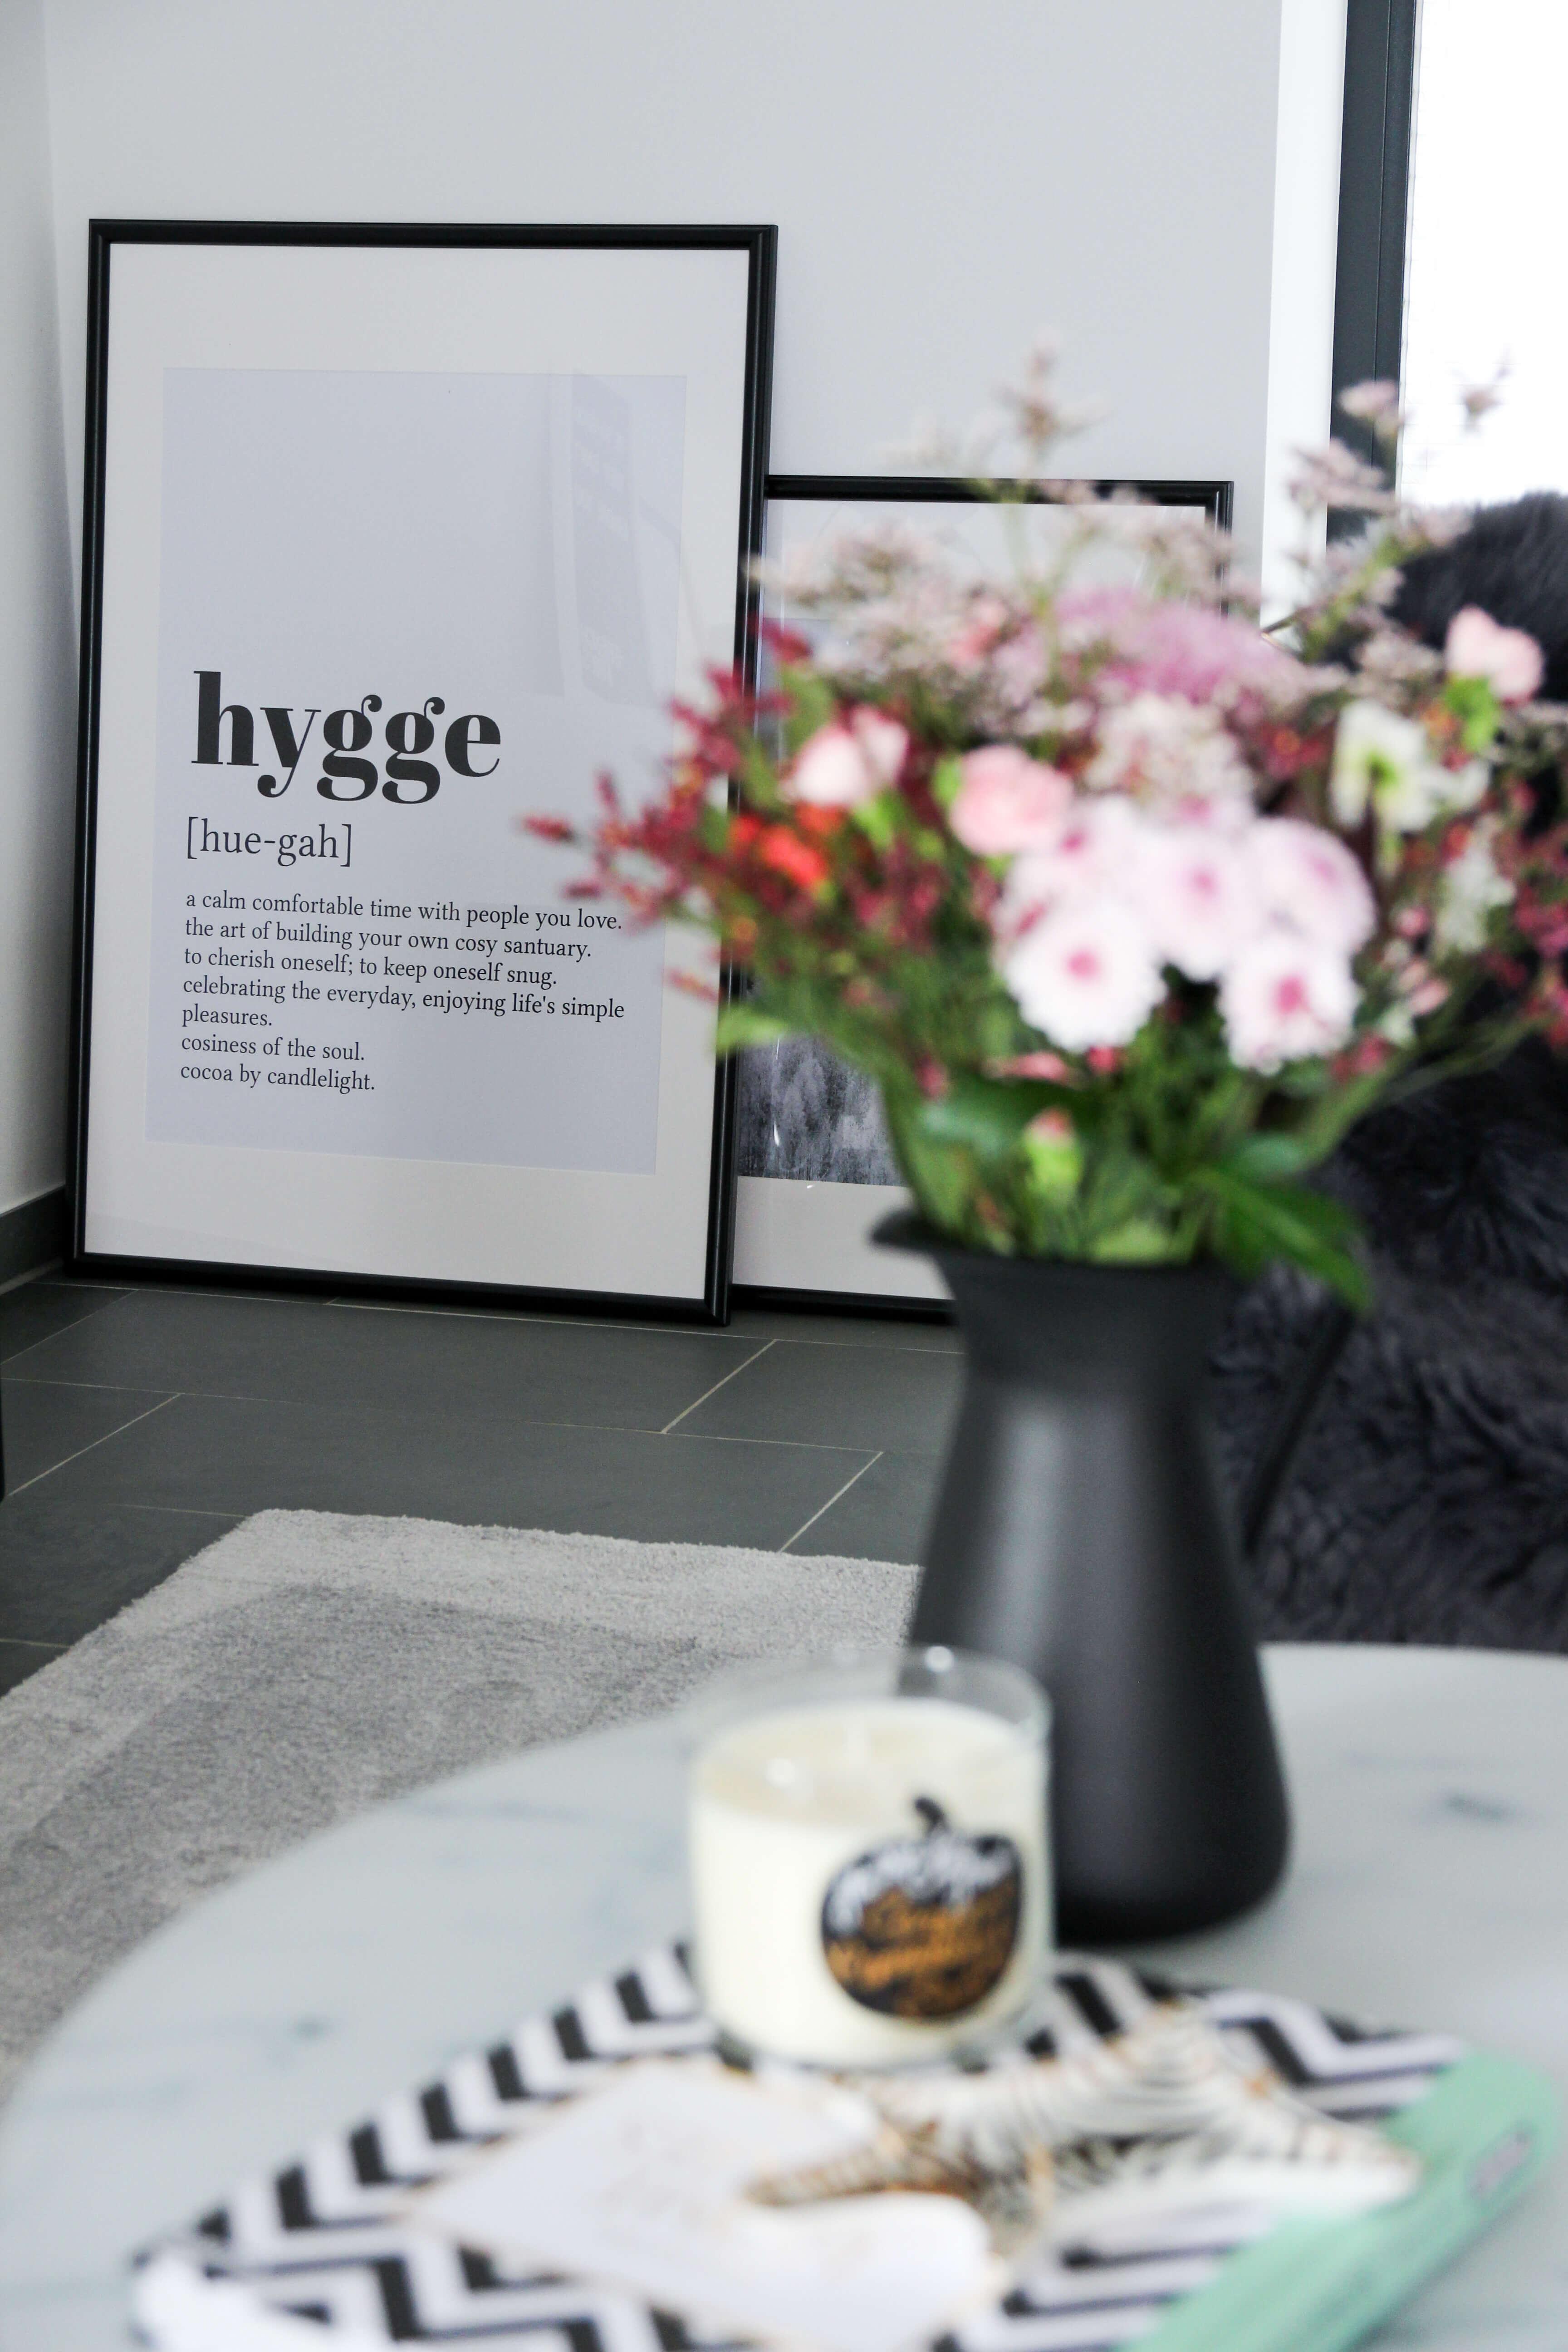 Wohnbereich Umgestaltung Hygge Lykke Buch Meik Wiking Deko Interior Westwing Bath and Bodyworks tantedine